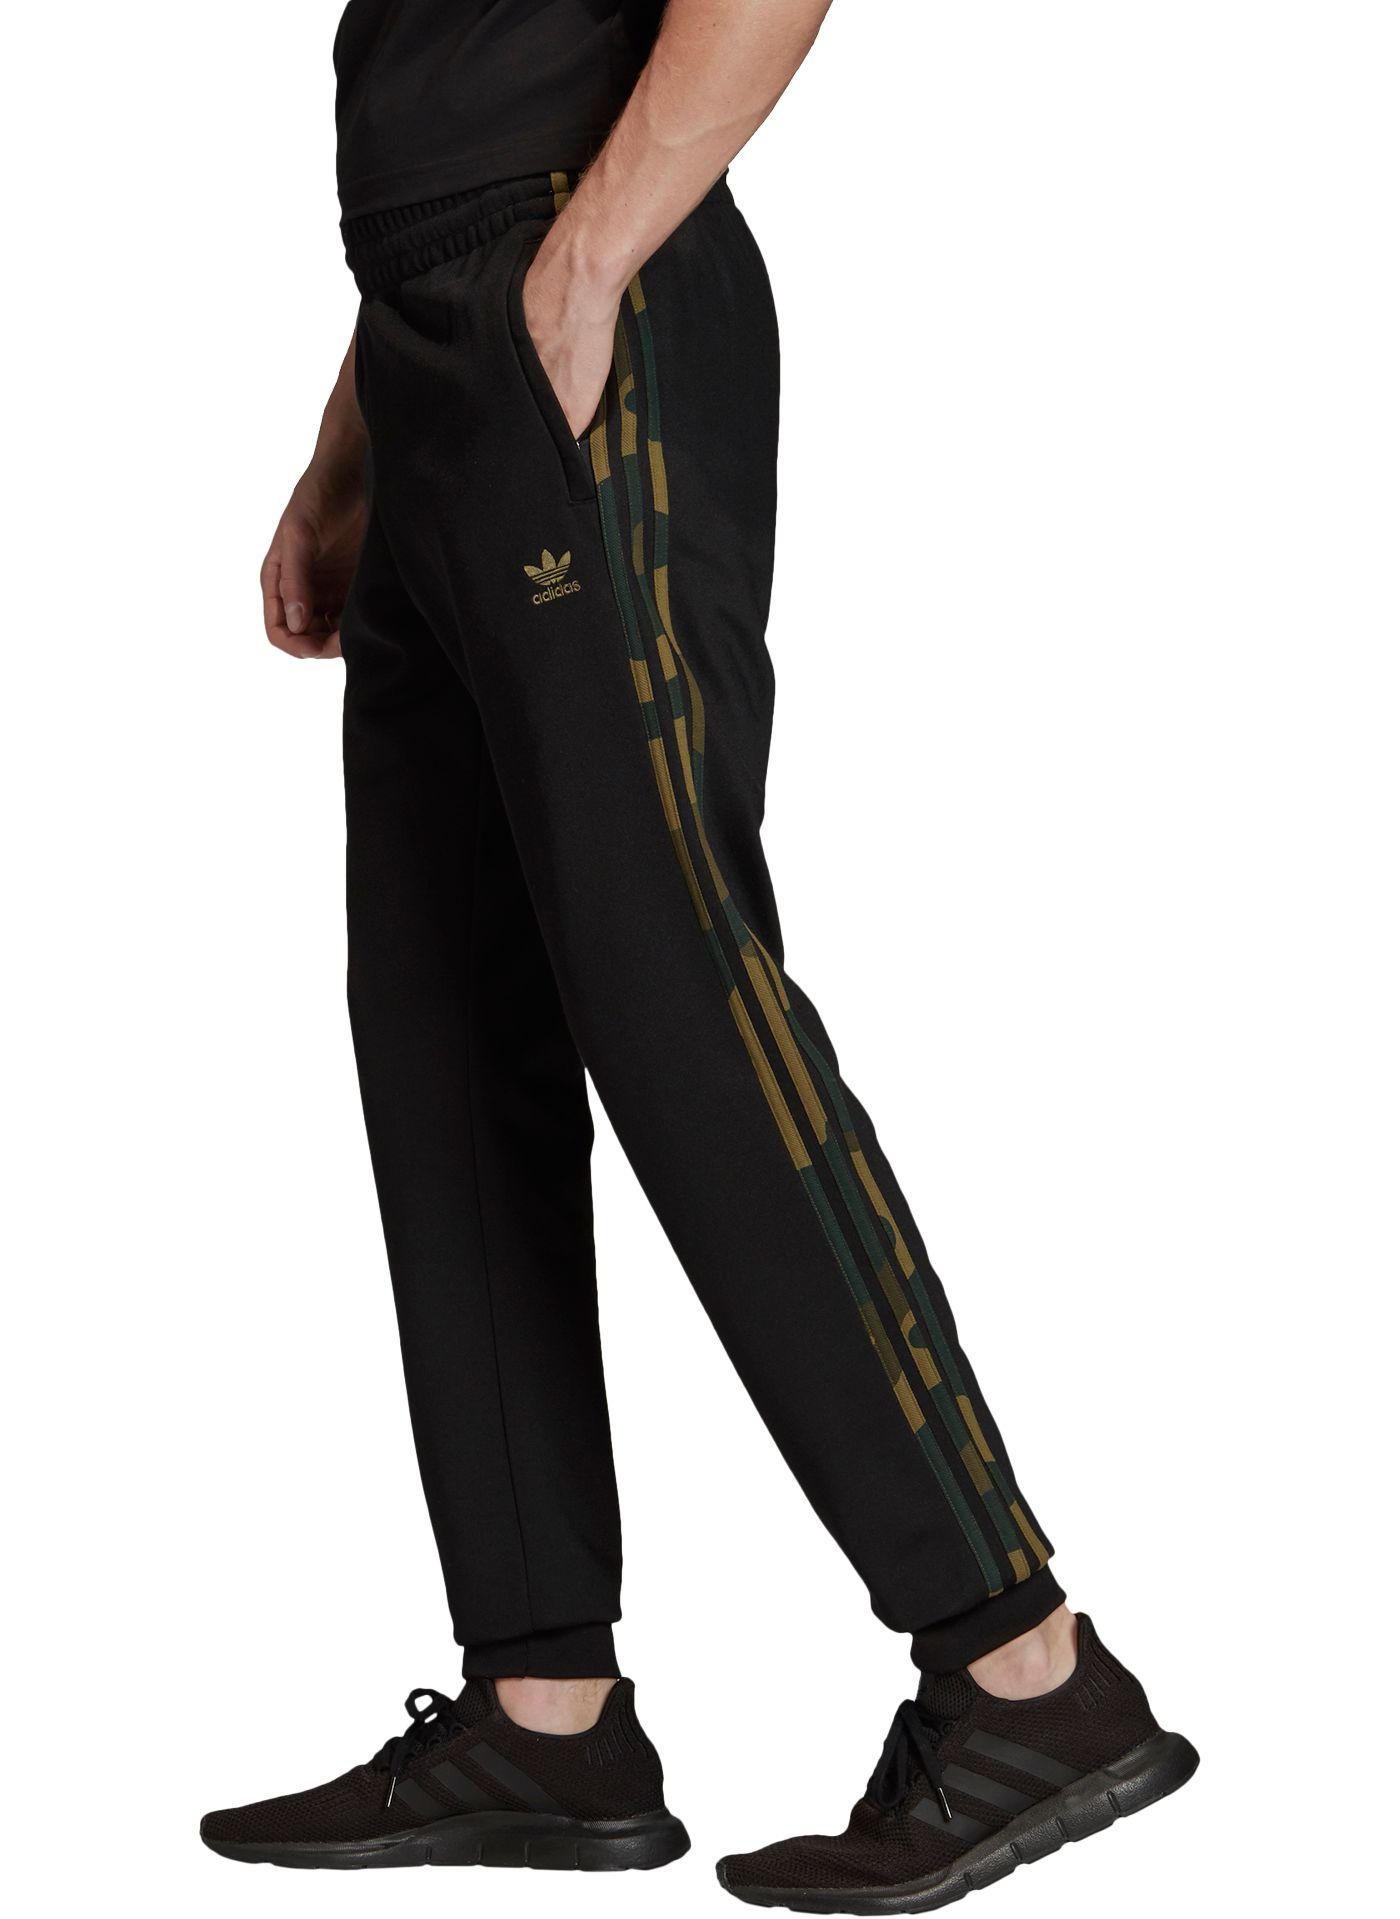 adidas Originals Men's Camouflage Track Pants